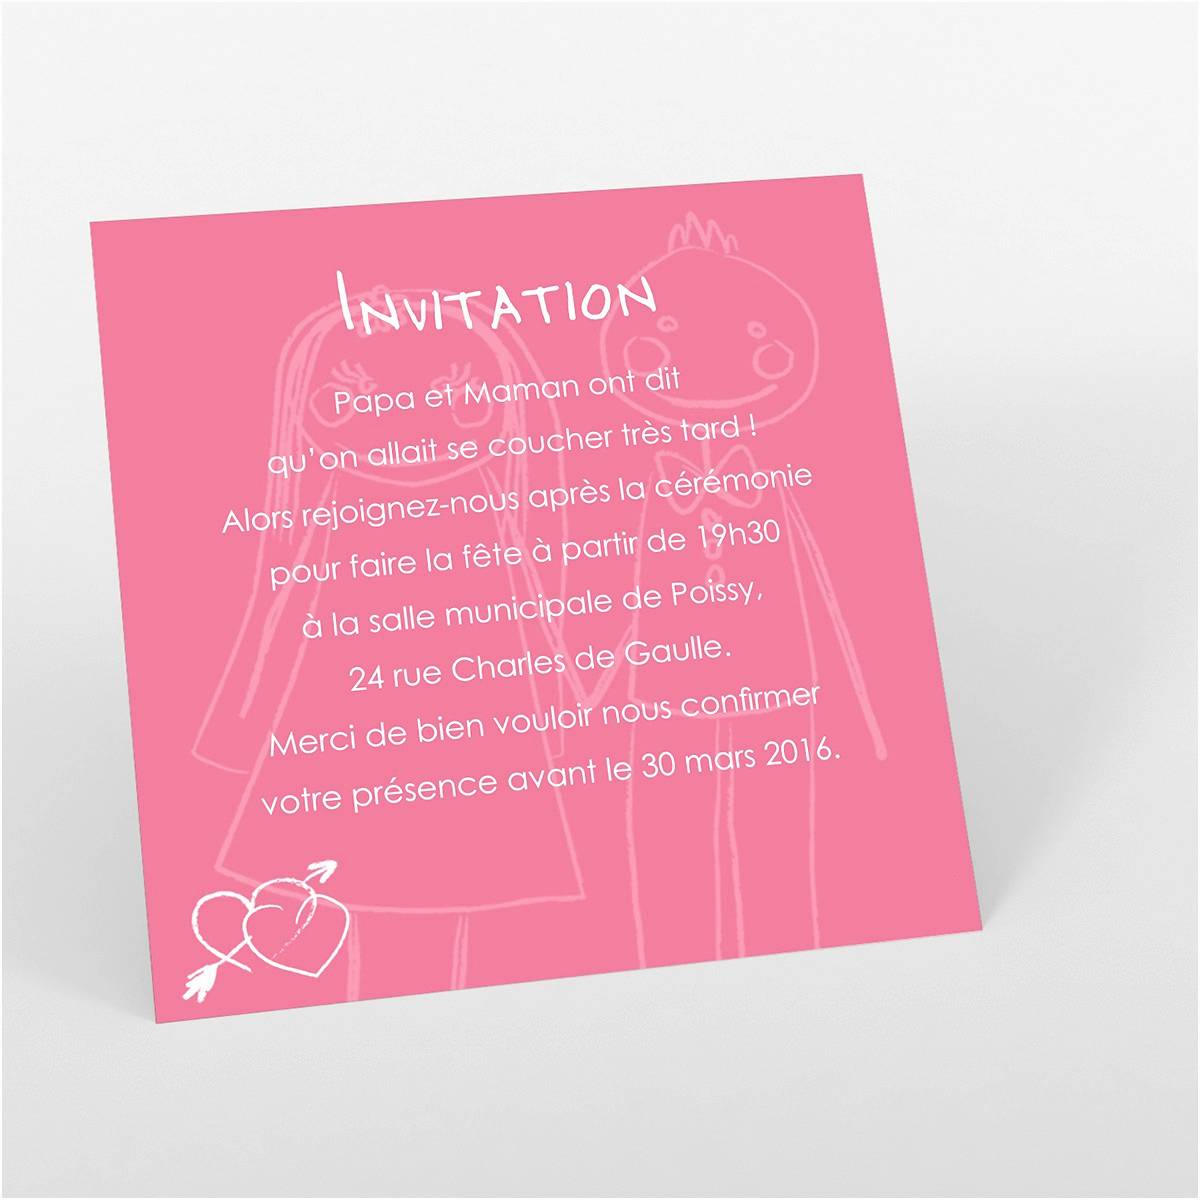 Texte invitation anniversaire au travail